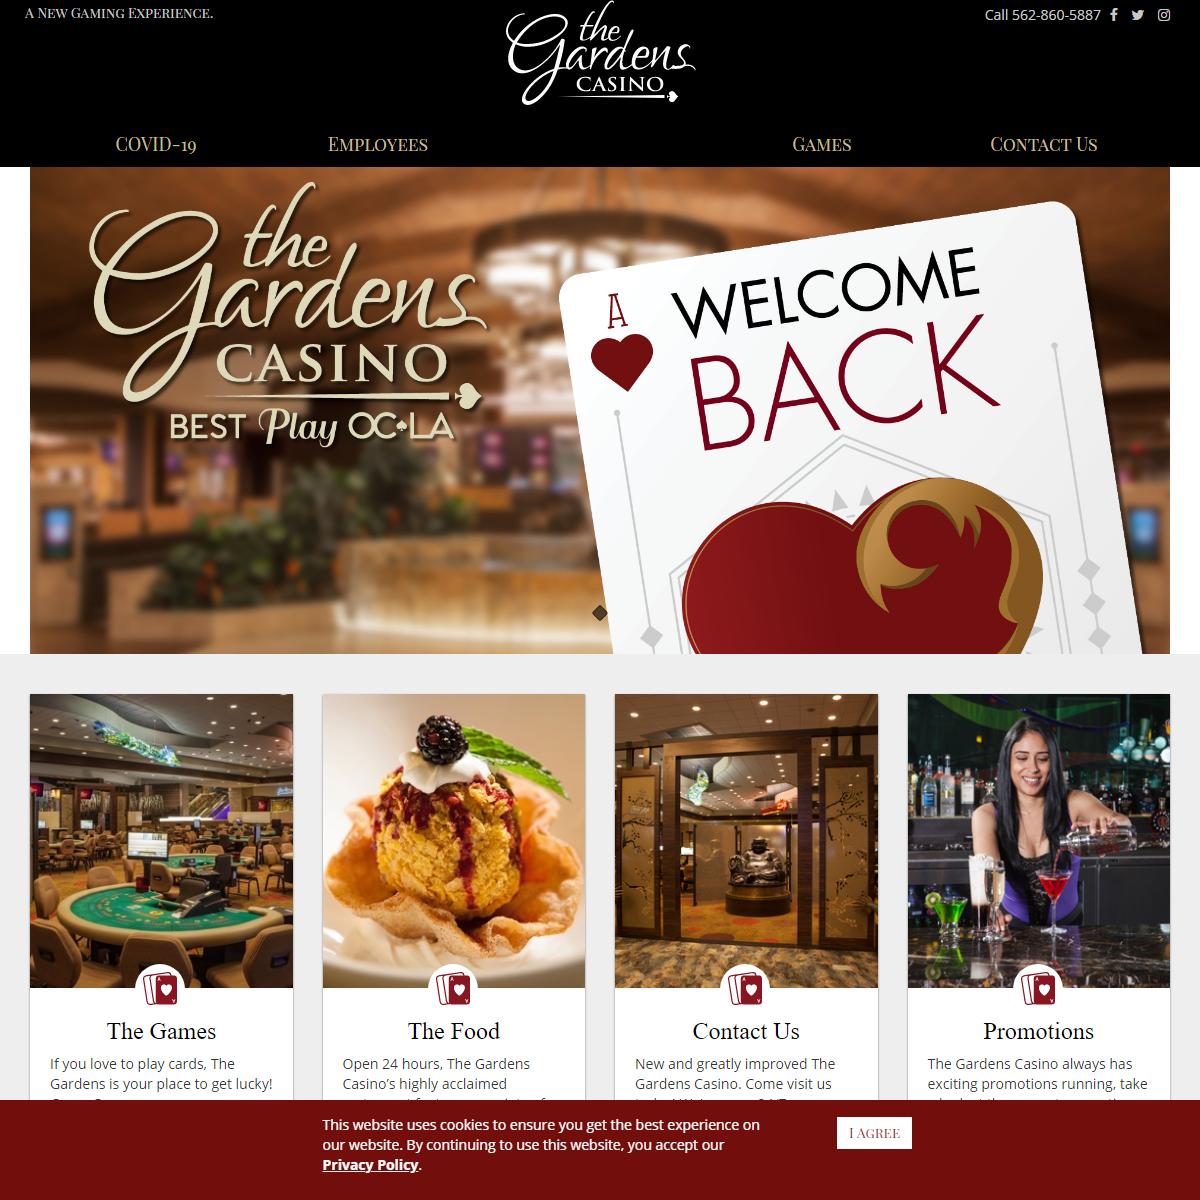 The Gardens Casino - Hawaiian Gardens